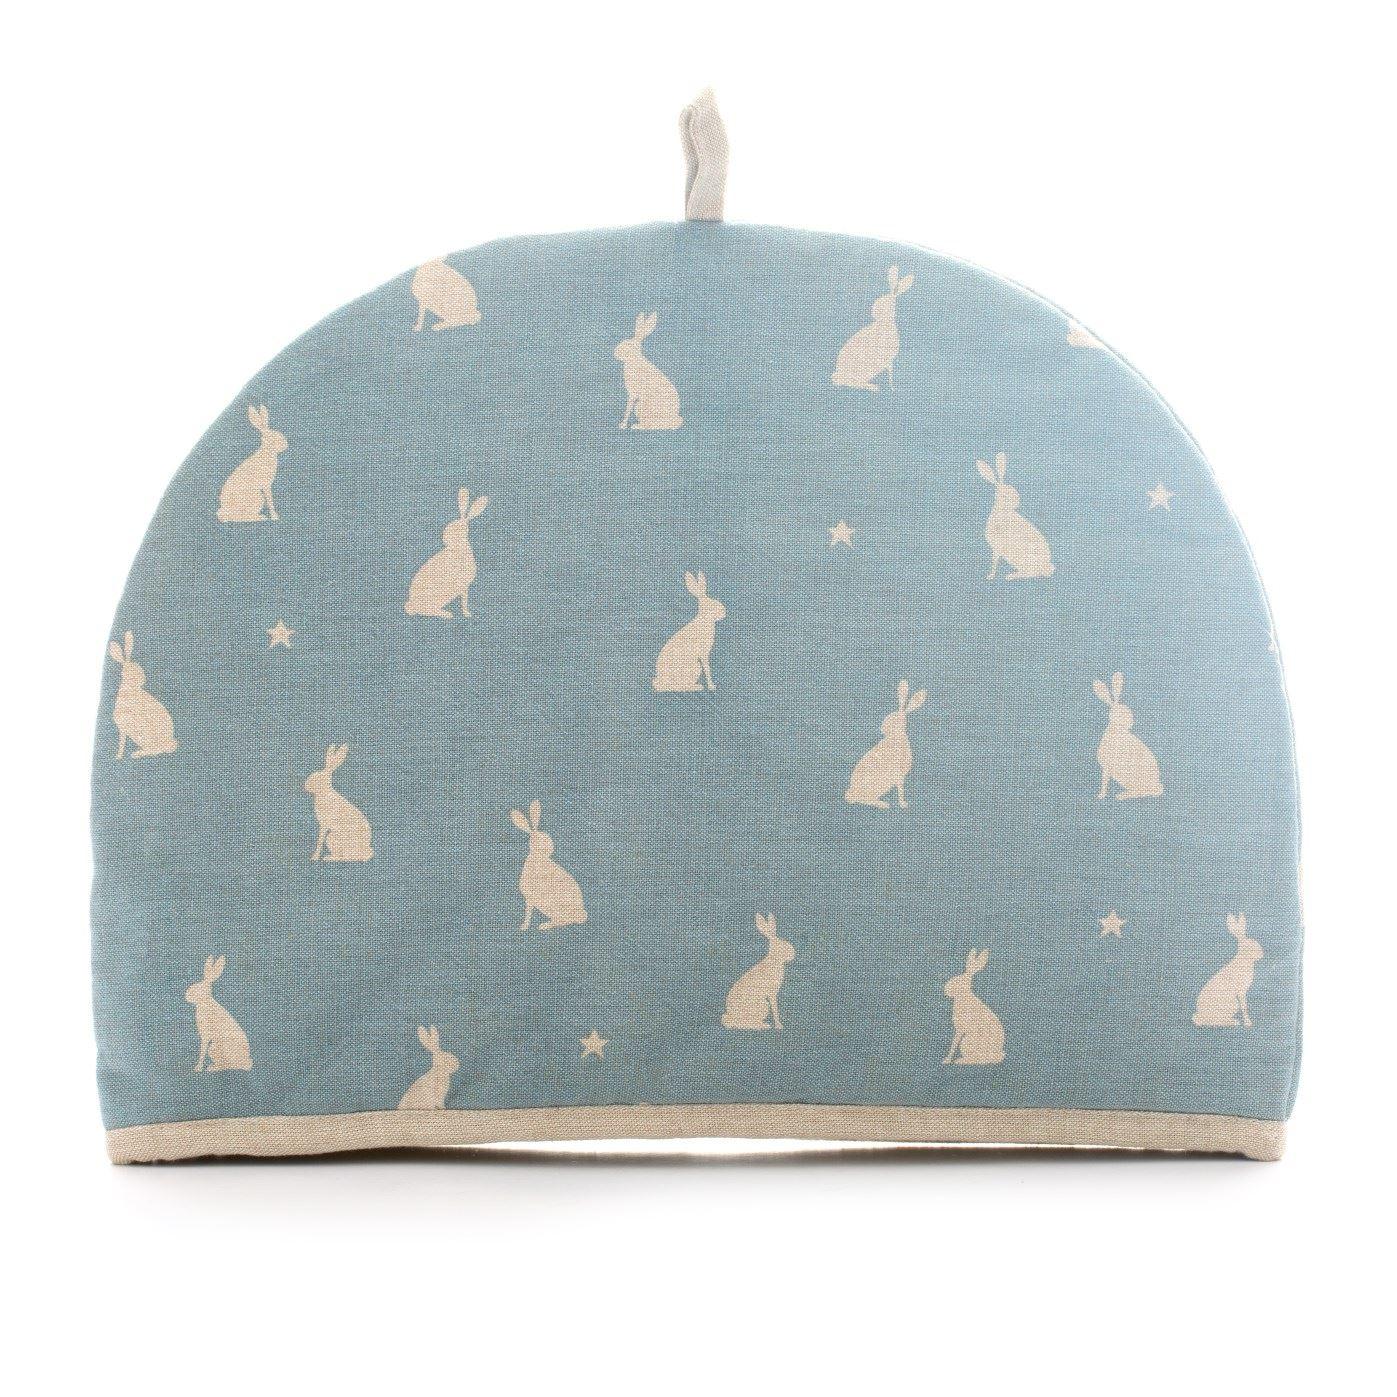 Rushbrookes Stargazing Hare Textiles Apron Oven Glove